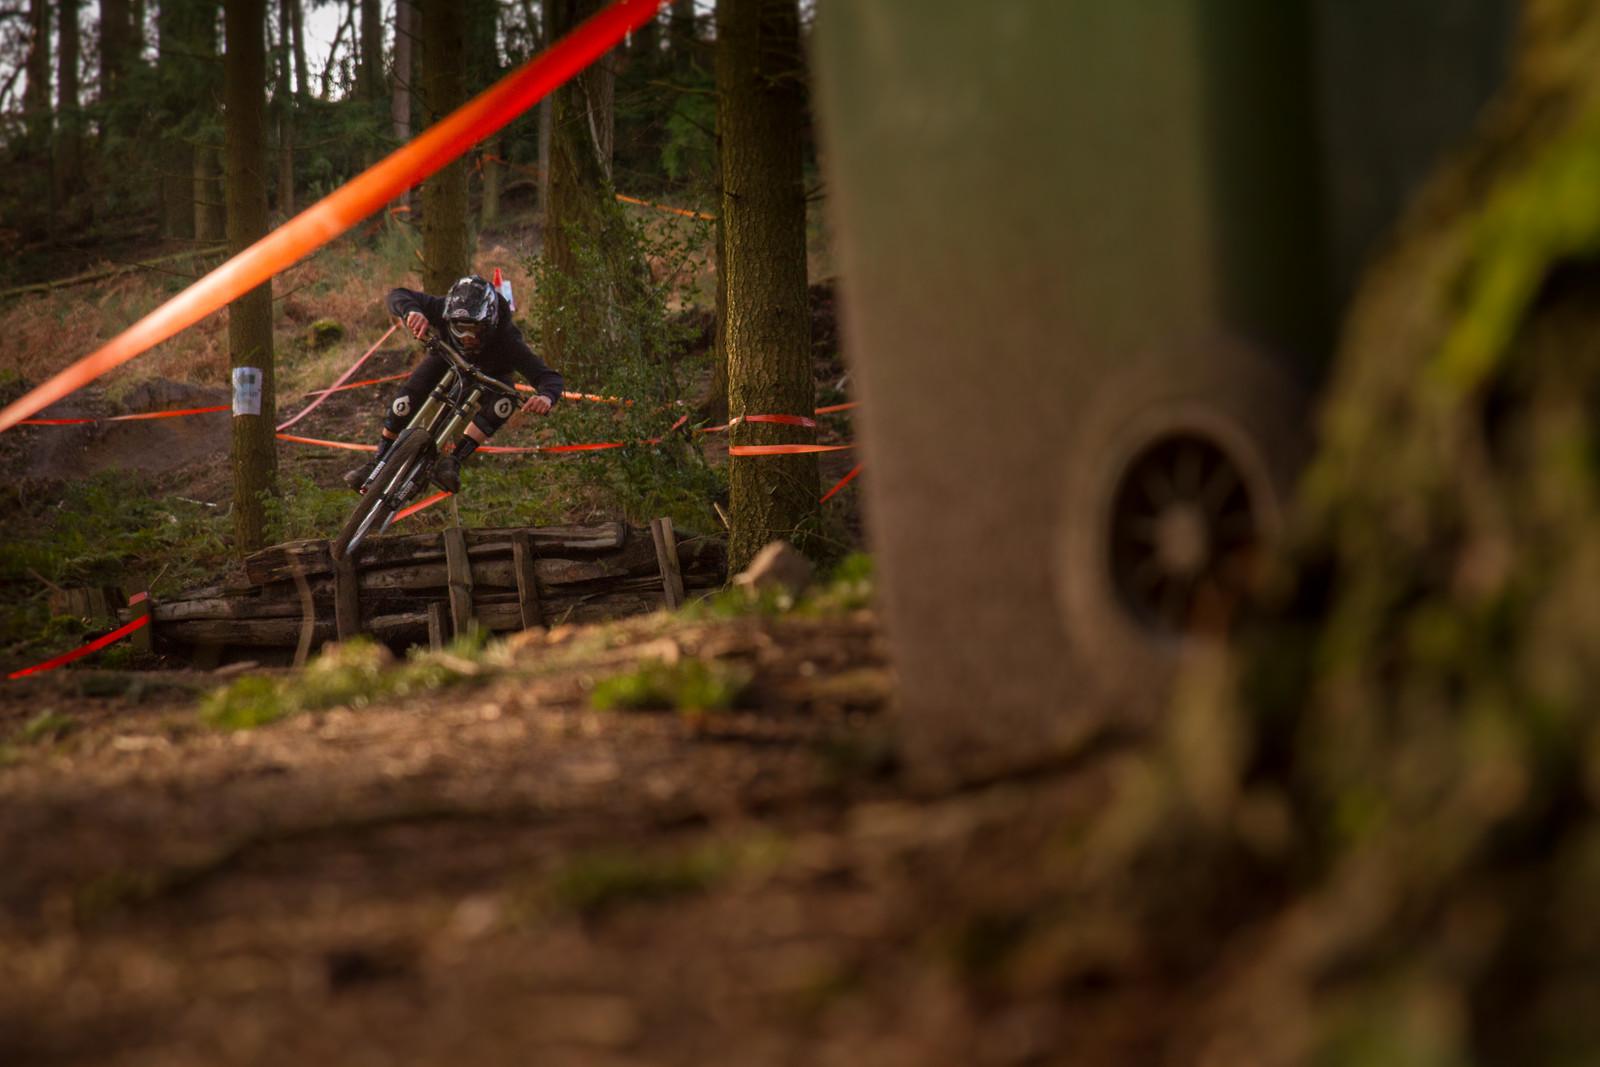 George Turnbull pinning it! - Visual Elements - Mountain Biking Pictures - Vital MTB